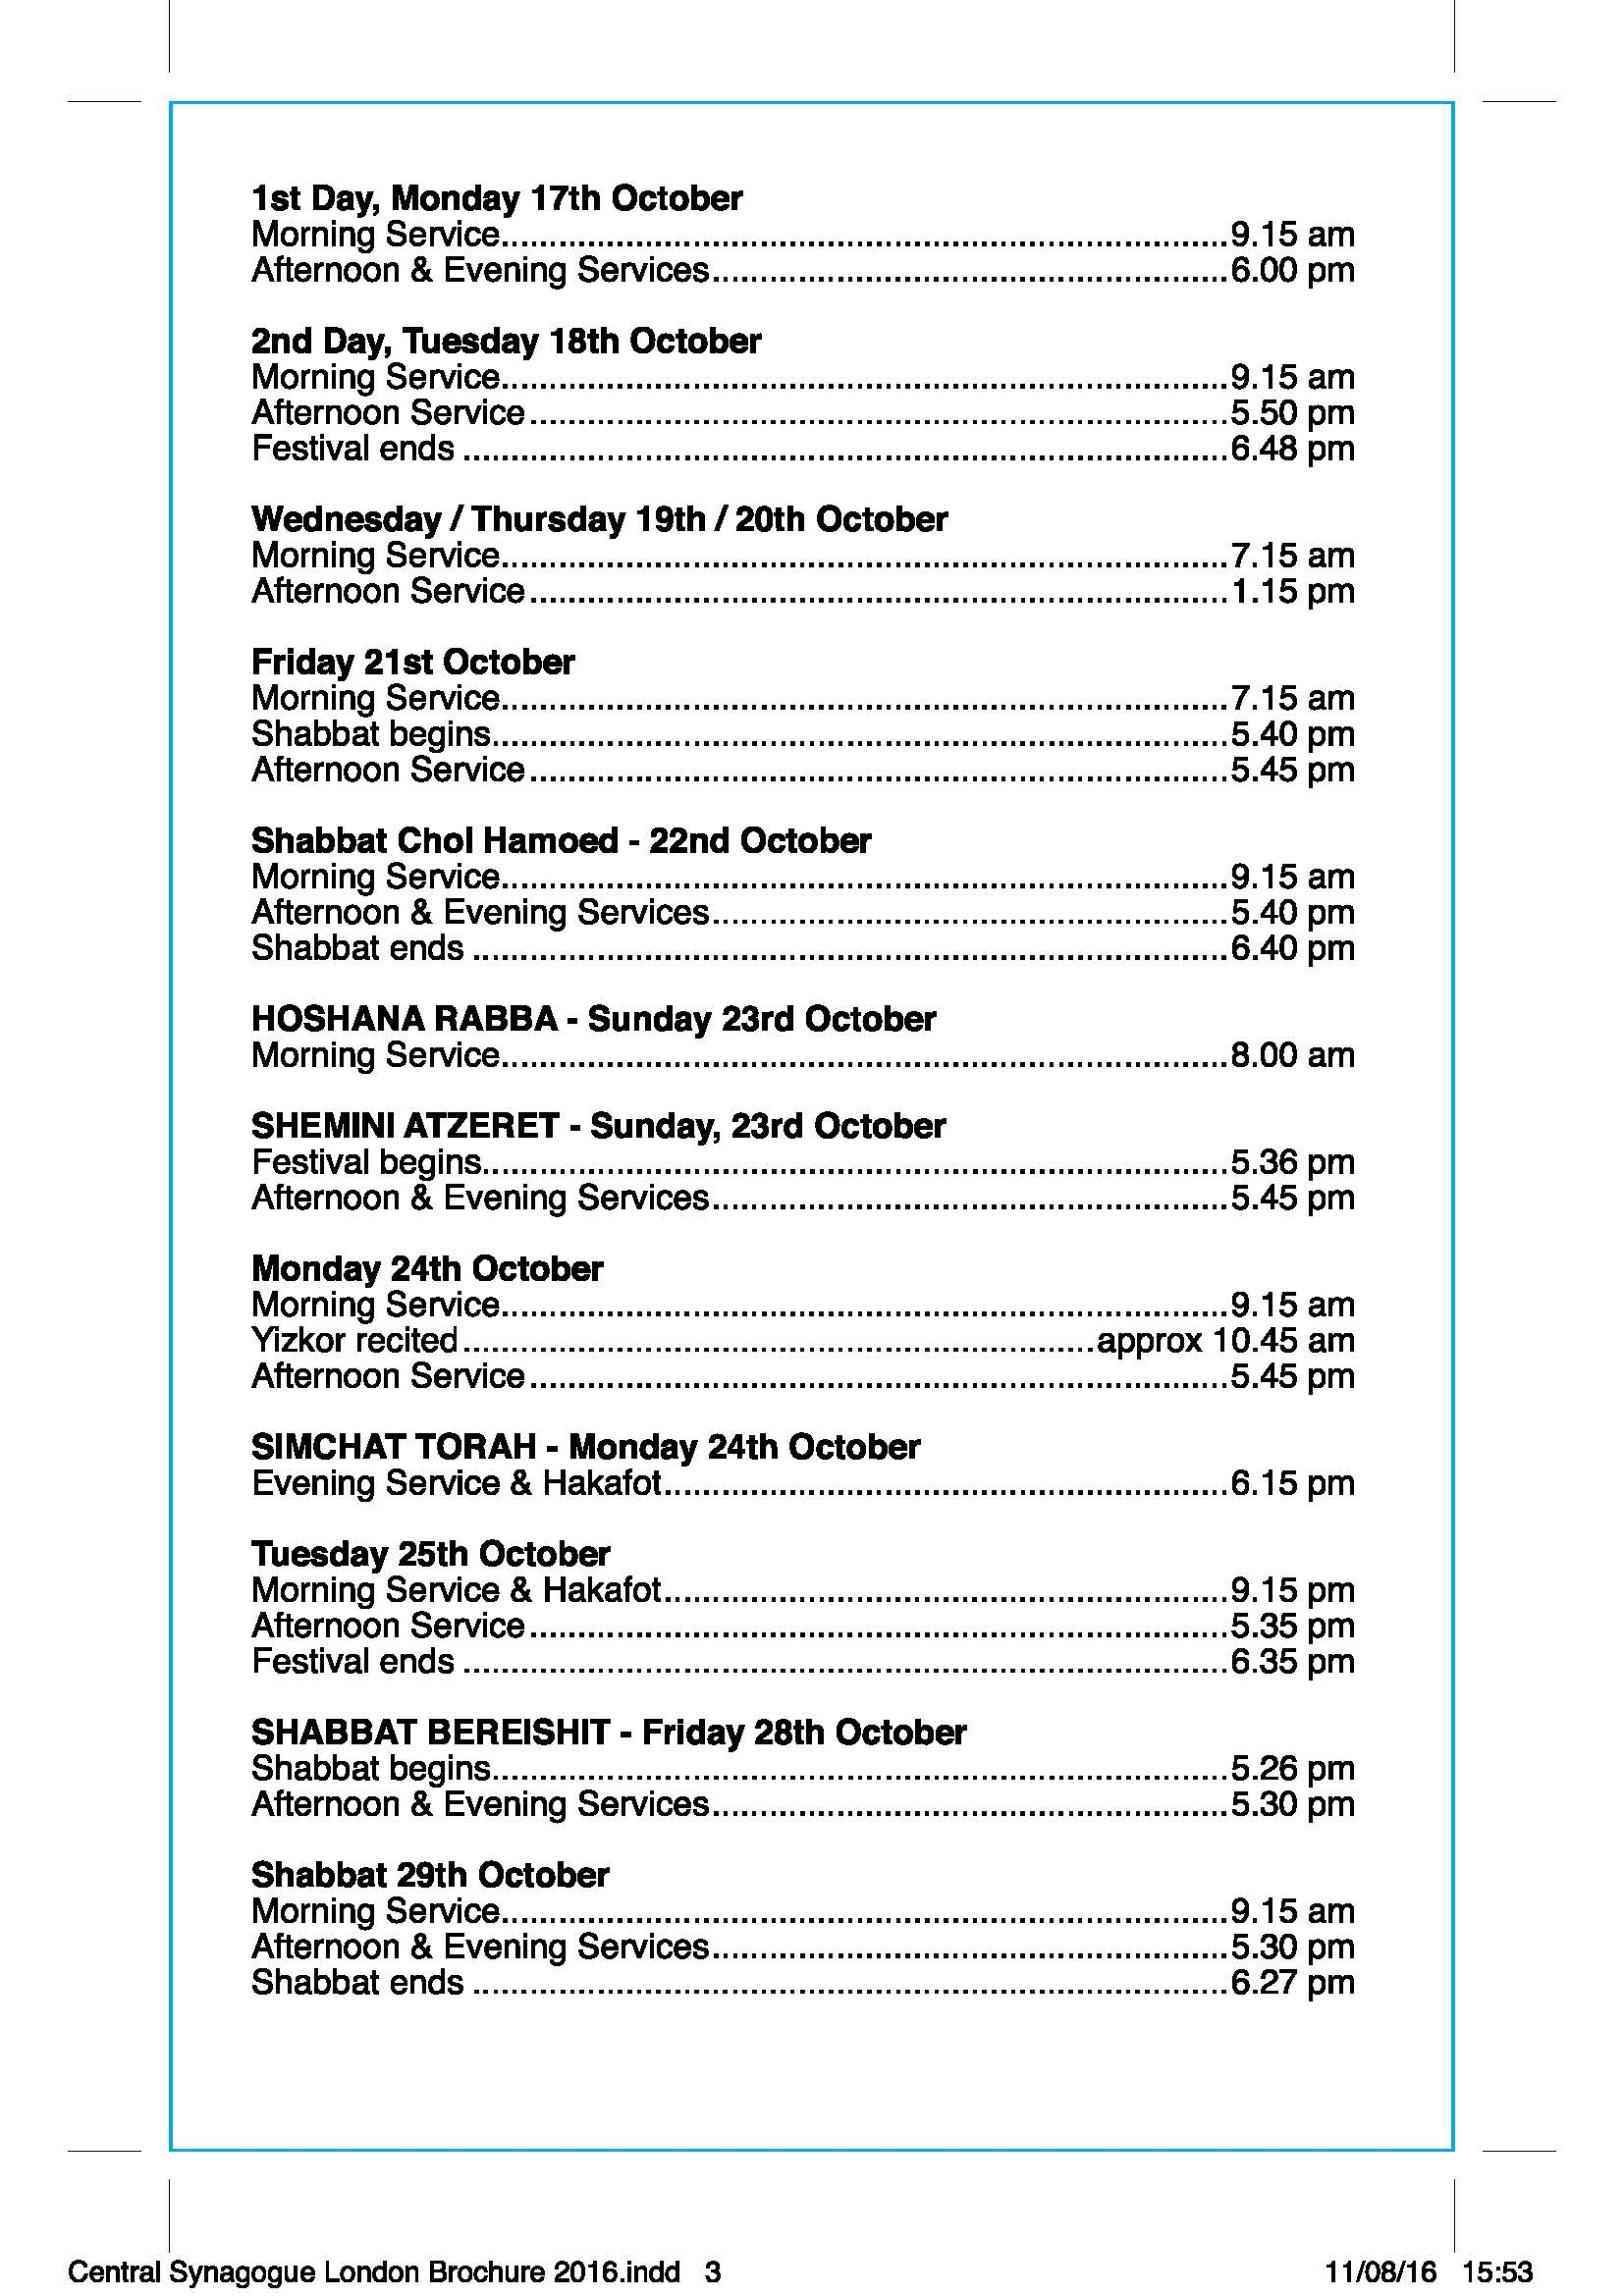 yamim-noraim-timetable-2016_page_2